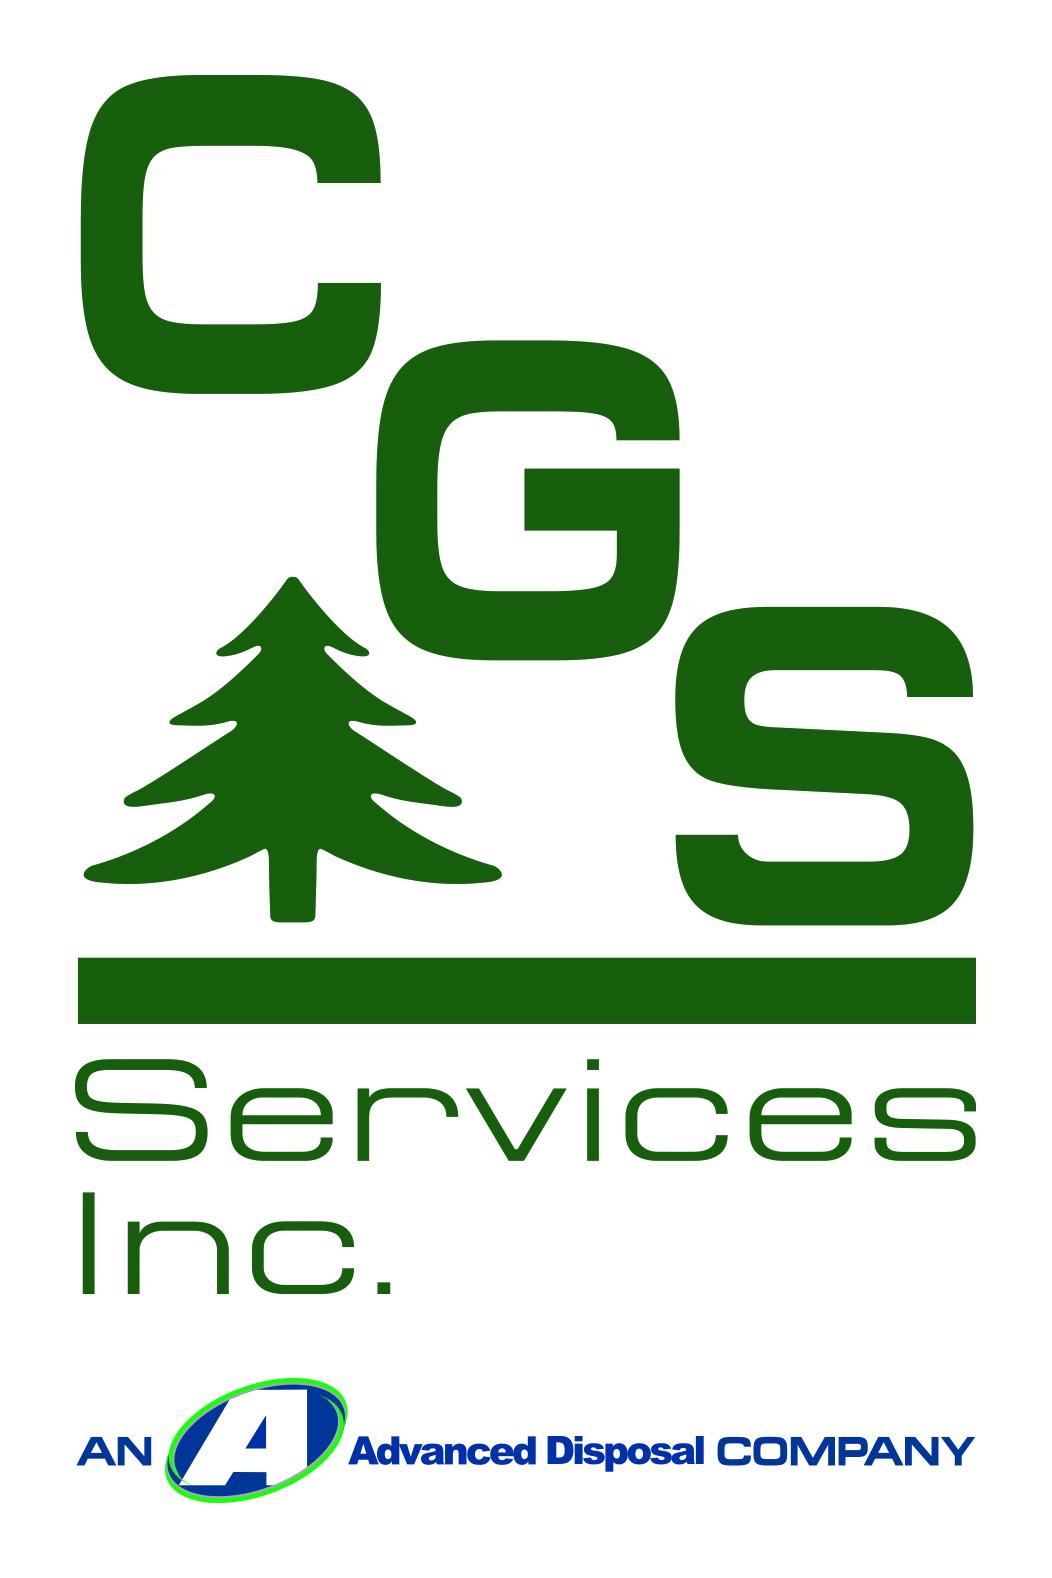 CGS Services, Inc.